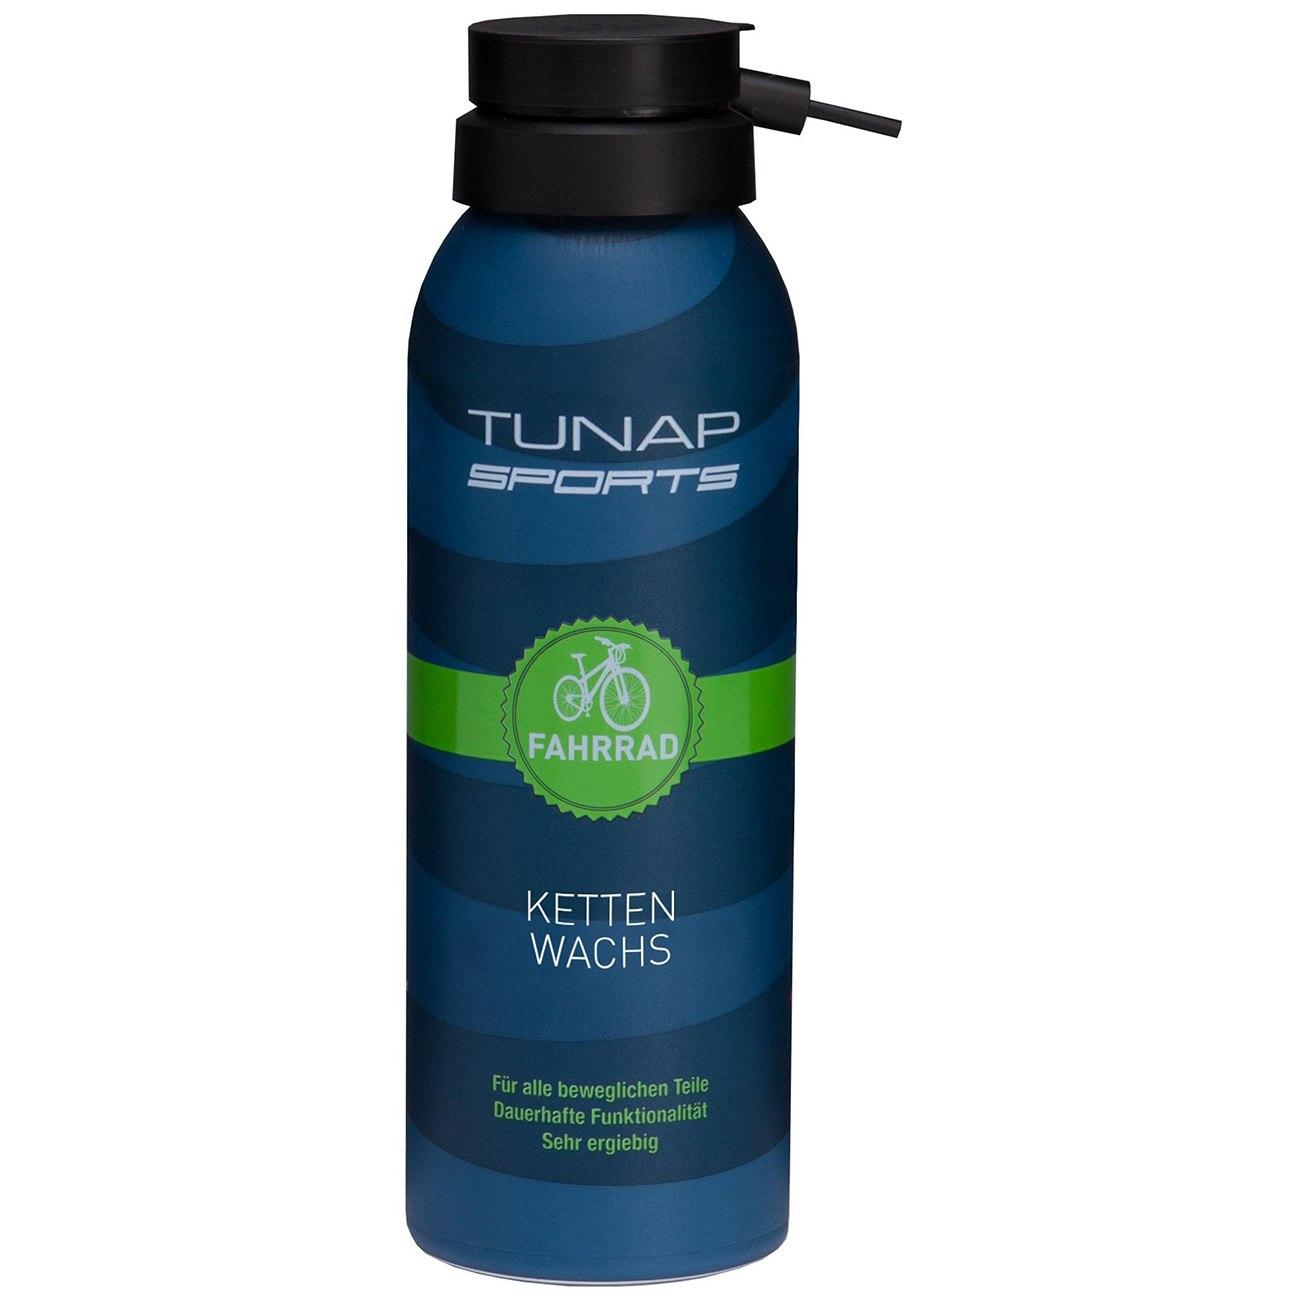 TUNAP Sports Chain Wax - 125ml